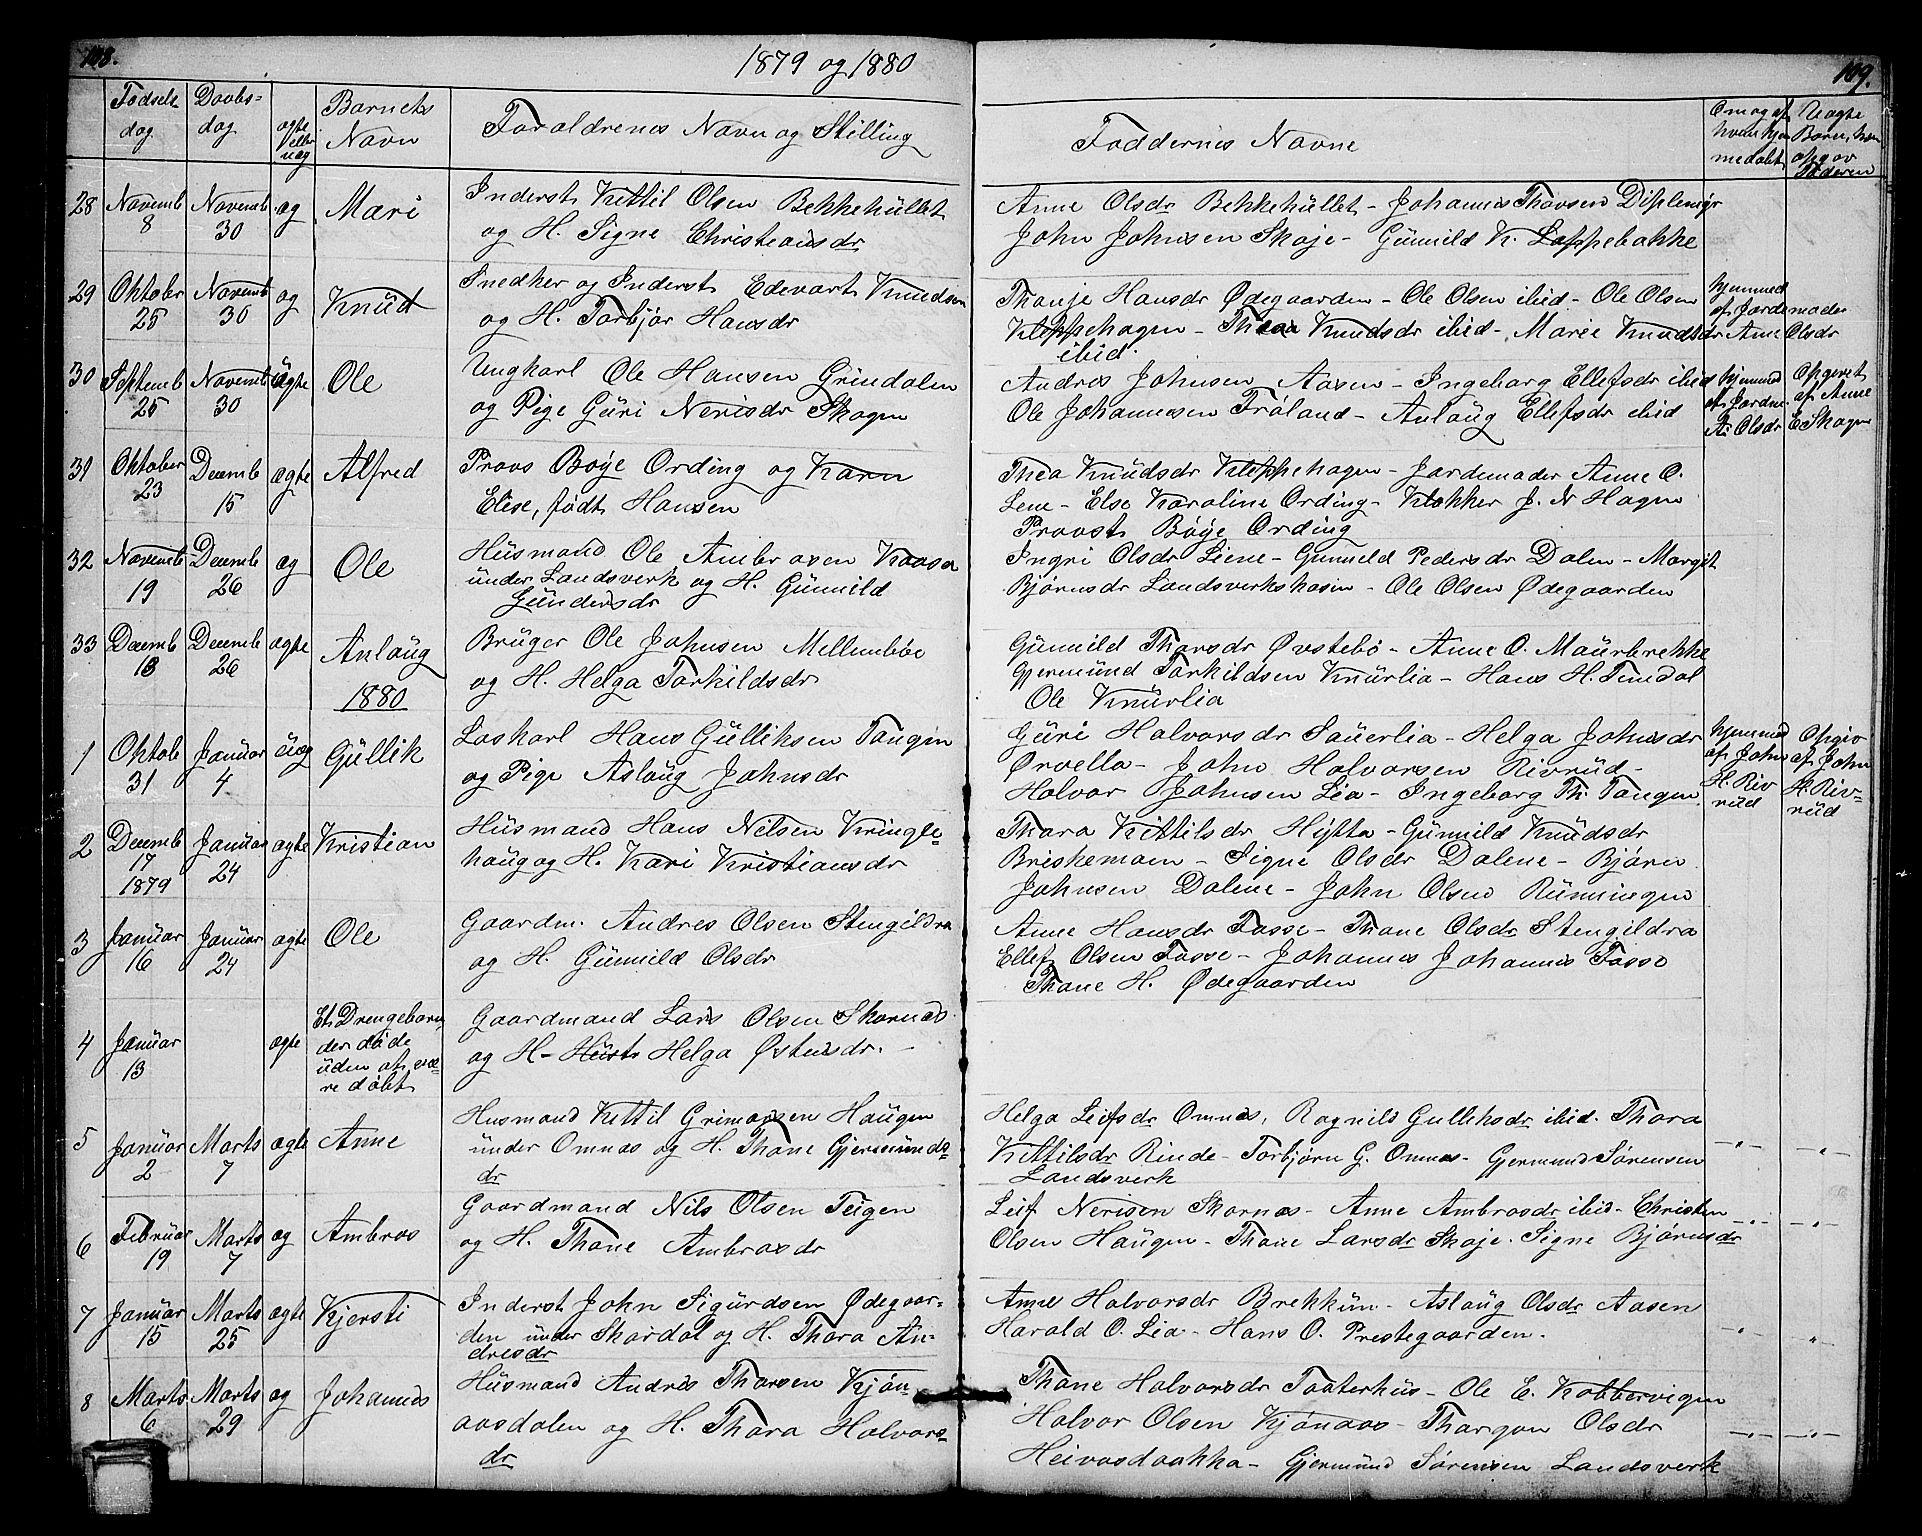 SAKO, Hjartdal kirkebøker, G/Gb/L0002: Klokkerbok nr. II 2, 1854-1884, s. 108-109